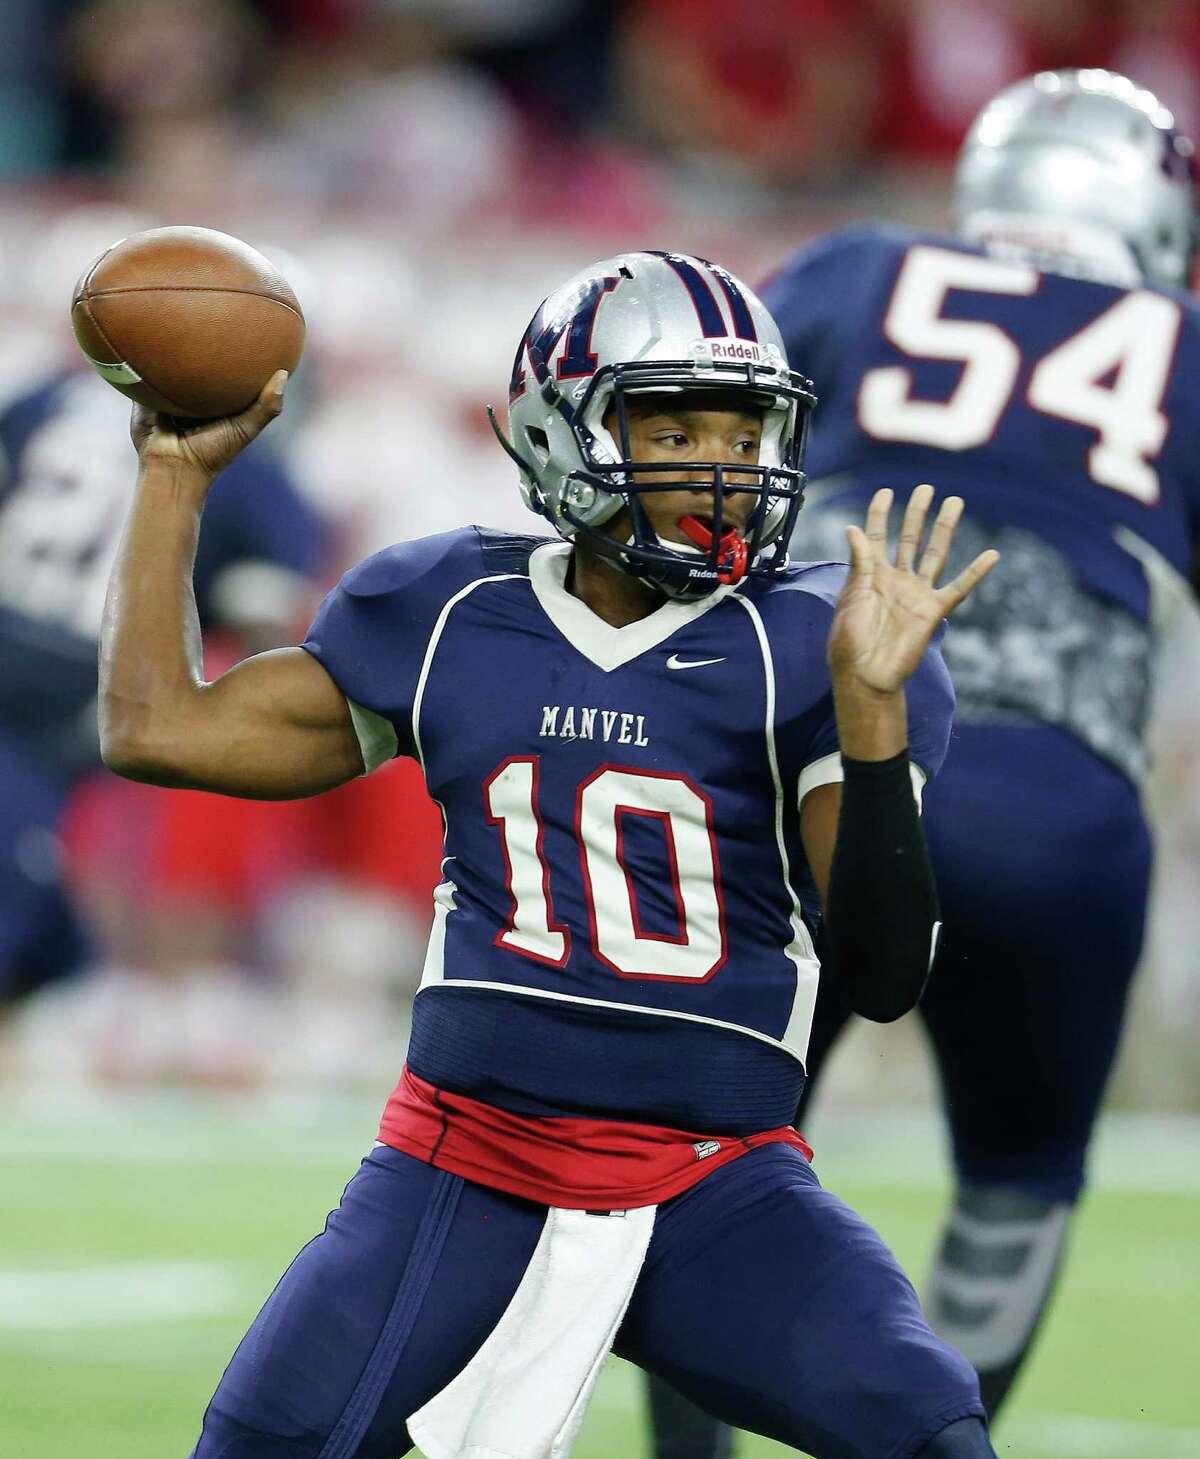 Manvel's QB Deriq King passes the ball during the first half of a high school football game at NRG Stadium on Friday, Dec. 4, 2015, in Houston ( Karen Warren / Houston Chronicle )